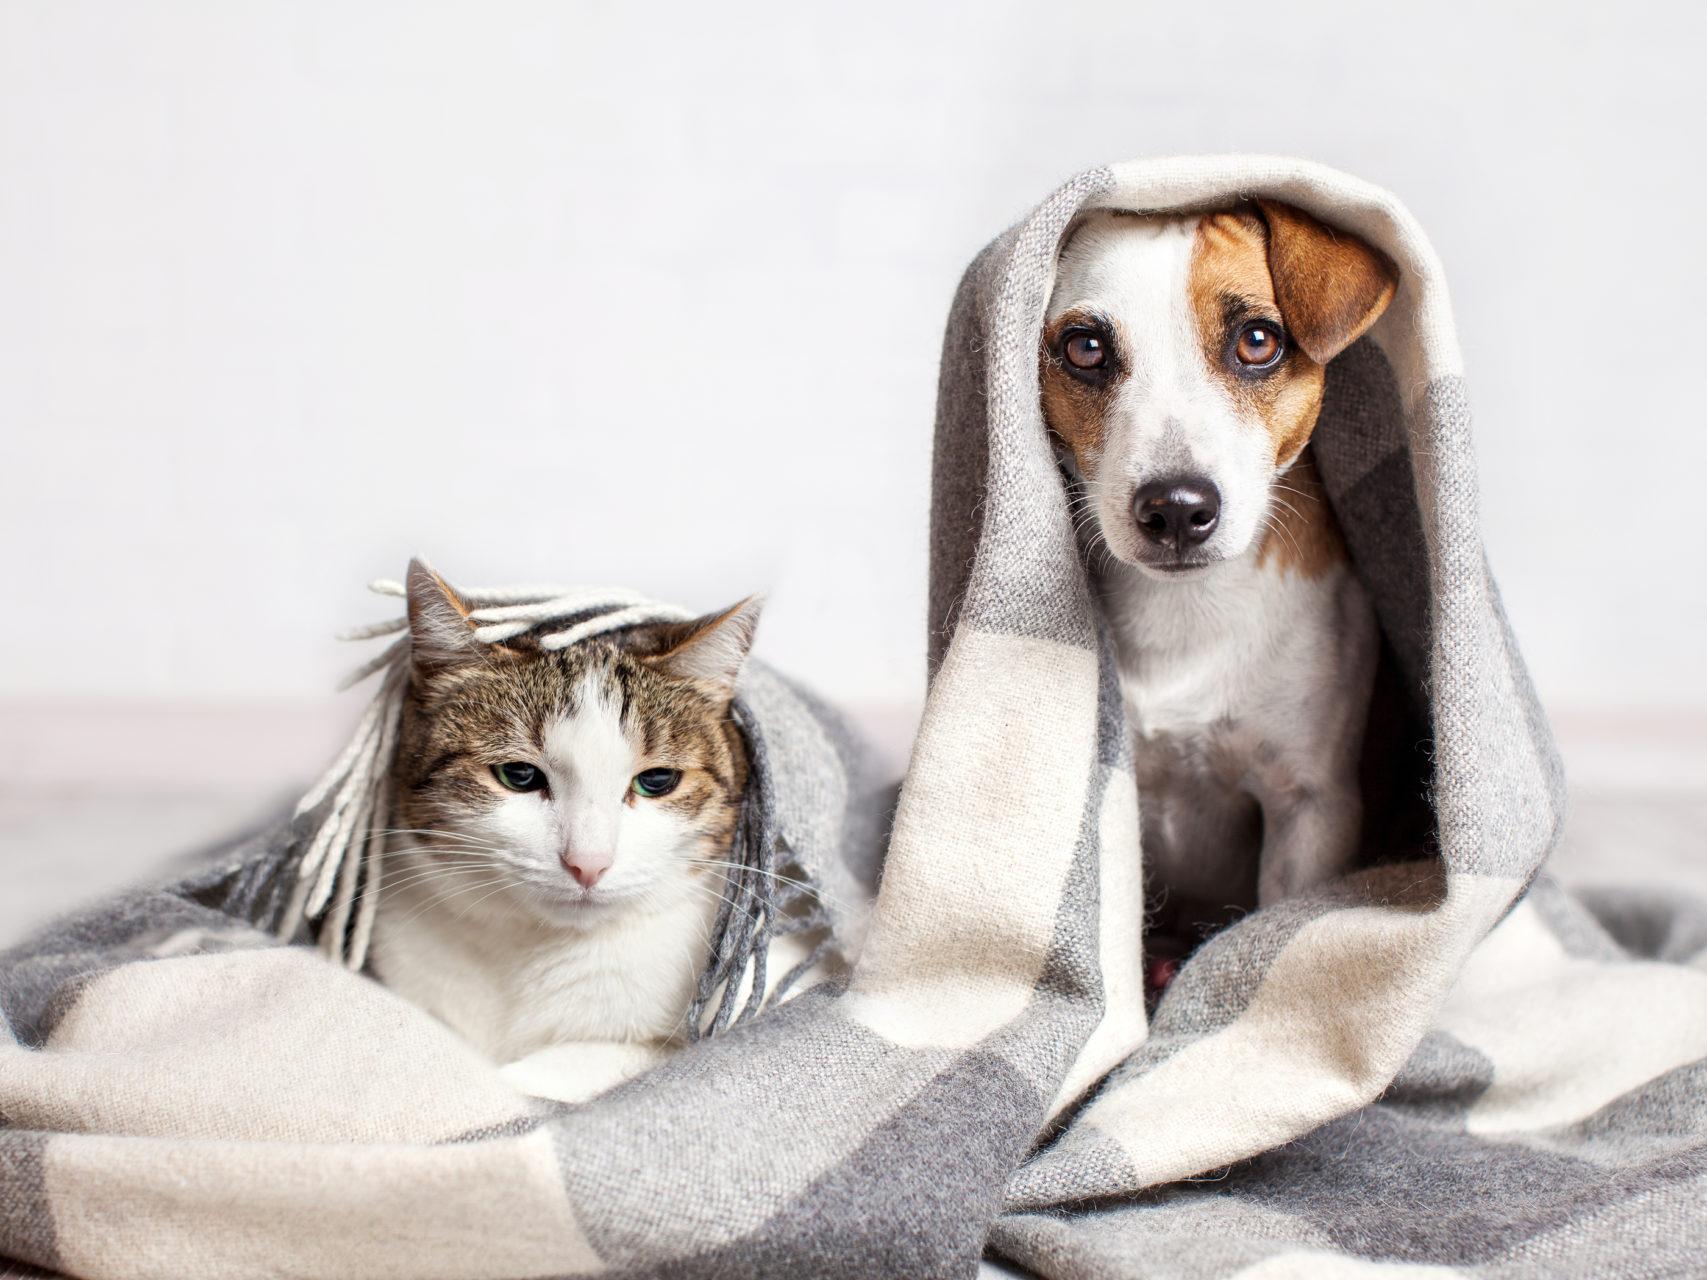 Ser humano também pode transmitir doenças aos pets